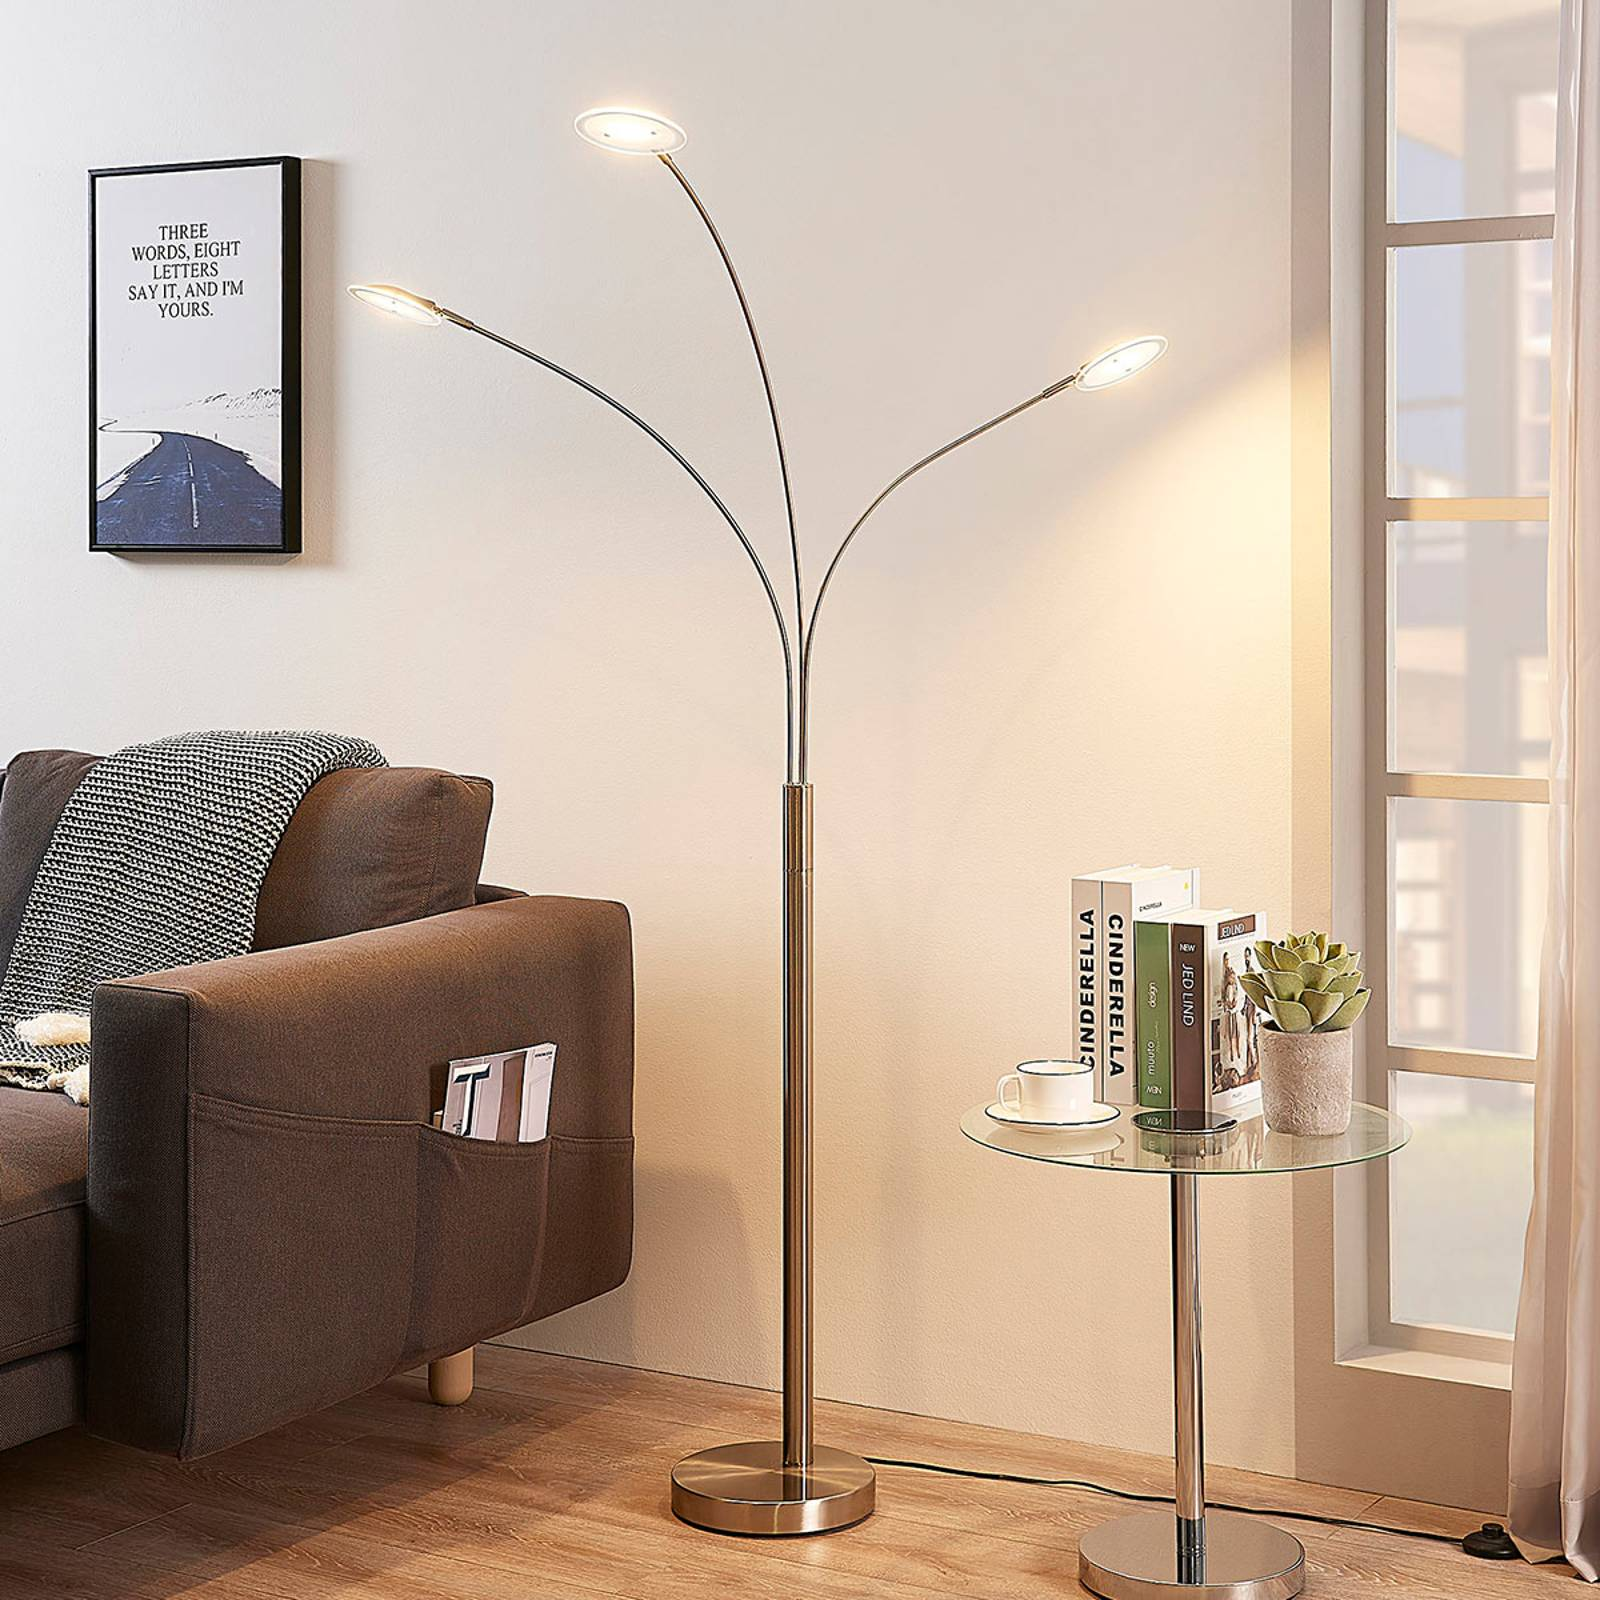 3-punktowa lampa stojąca LED Anea